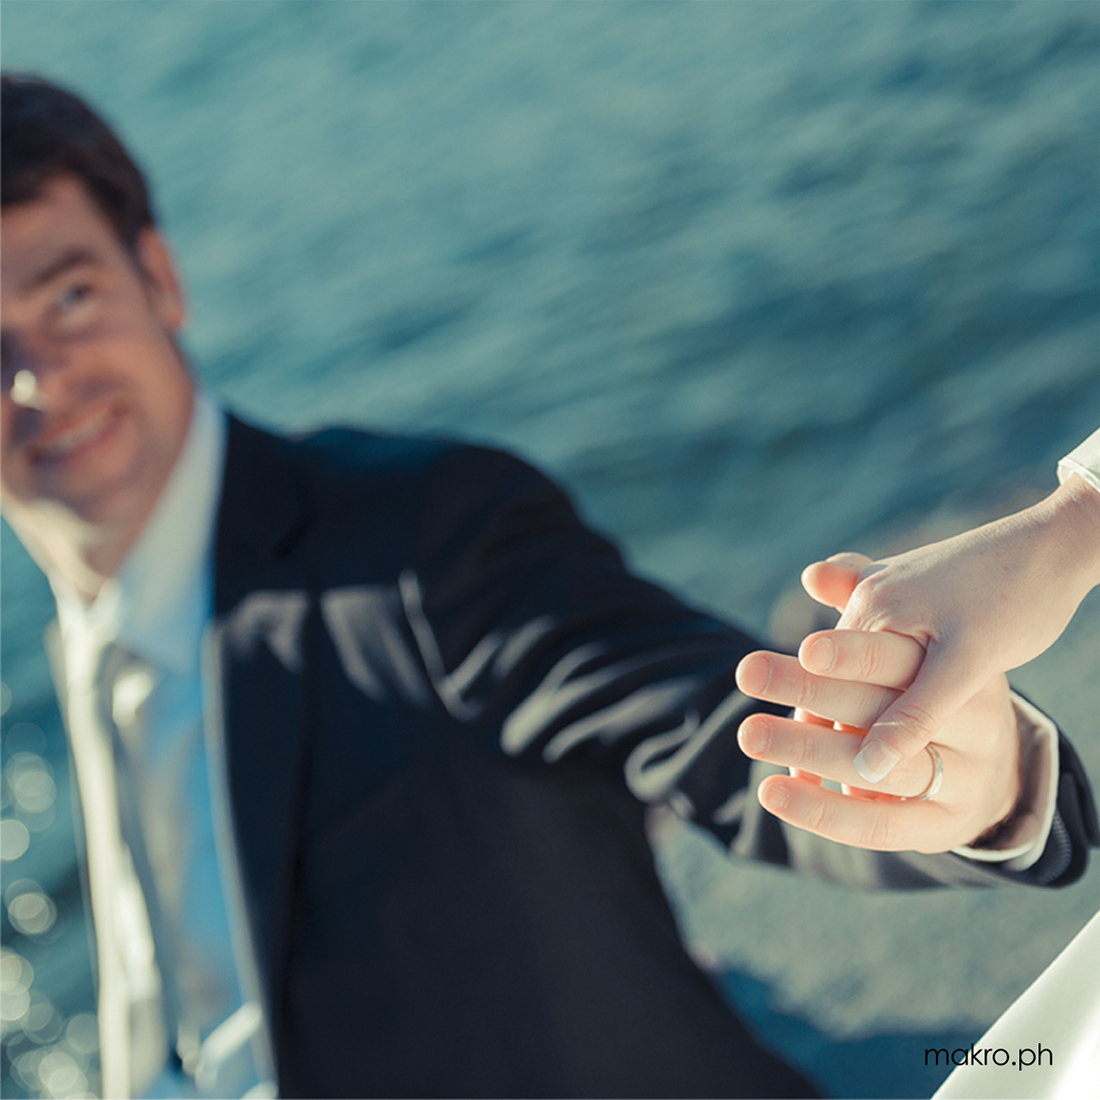 MAKRO phtographers, fotografi matrimonio in Ticino